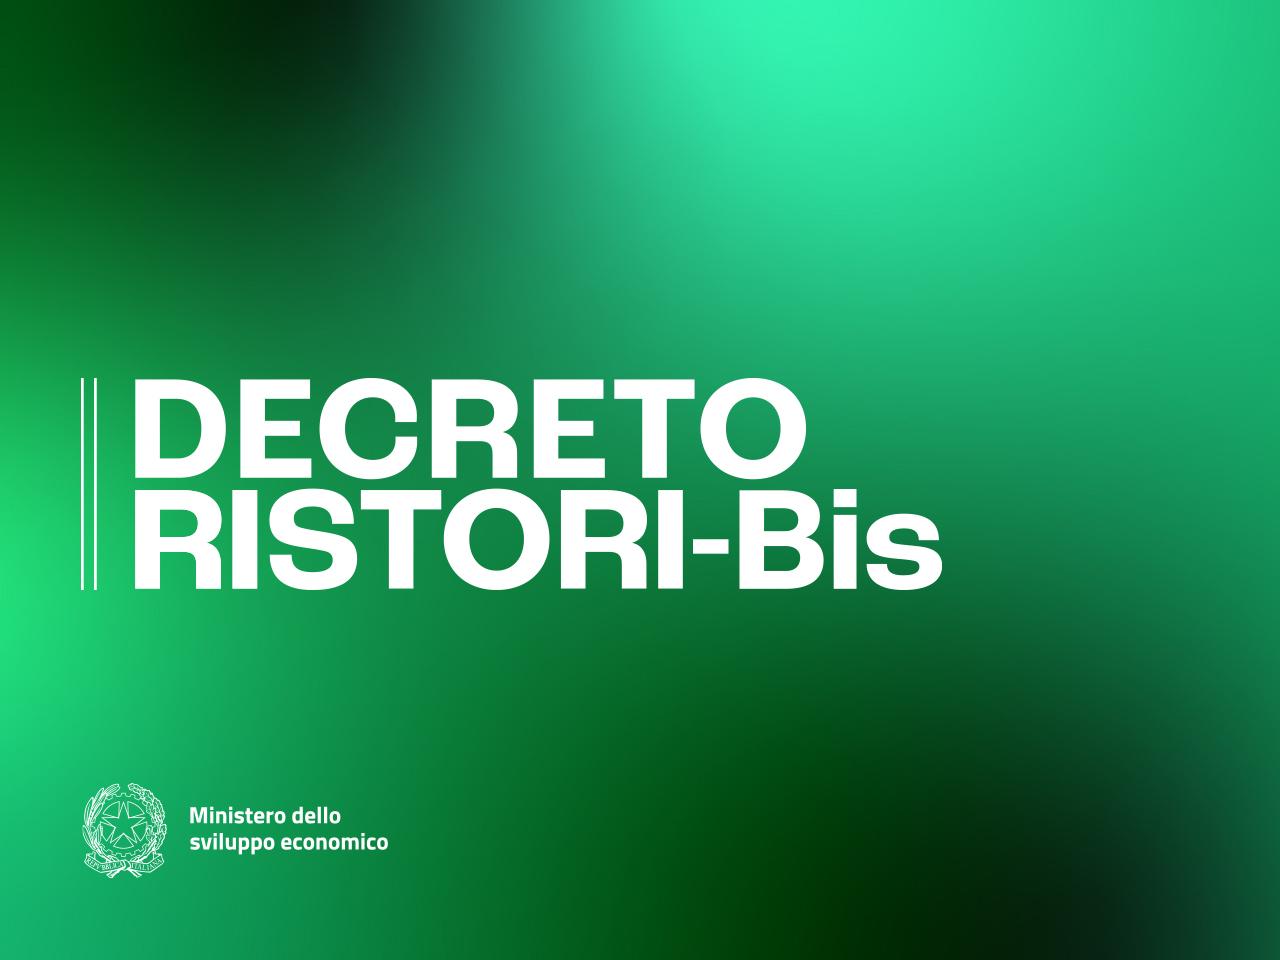 Decreto Ristori Bis